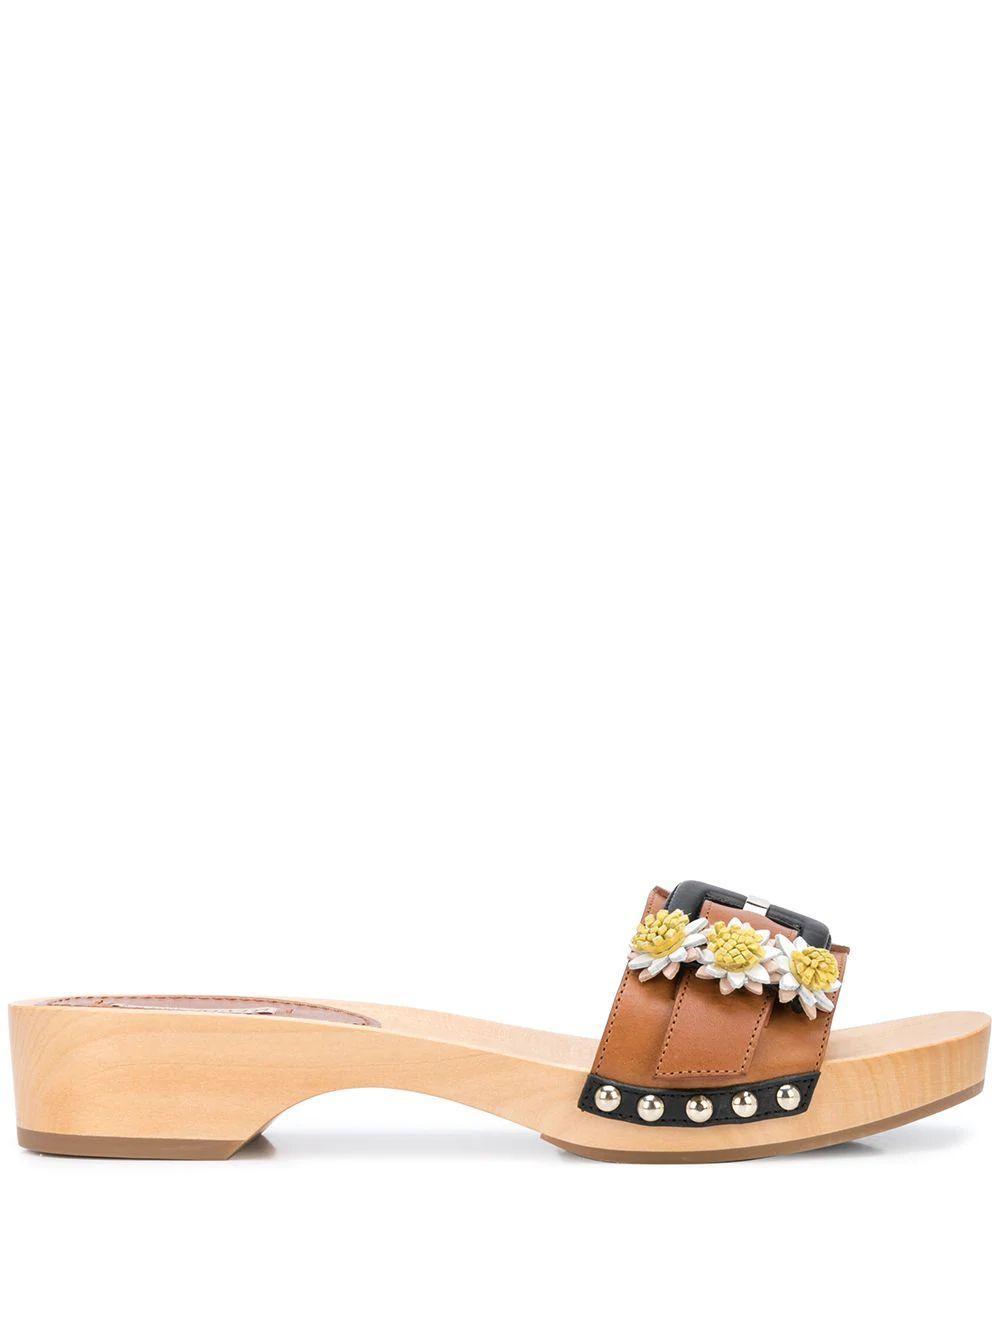 Jean Daisy Mini Mule Sandal